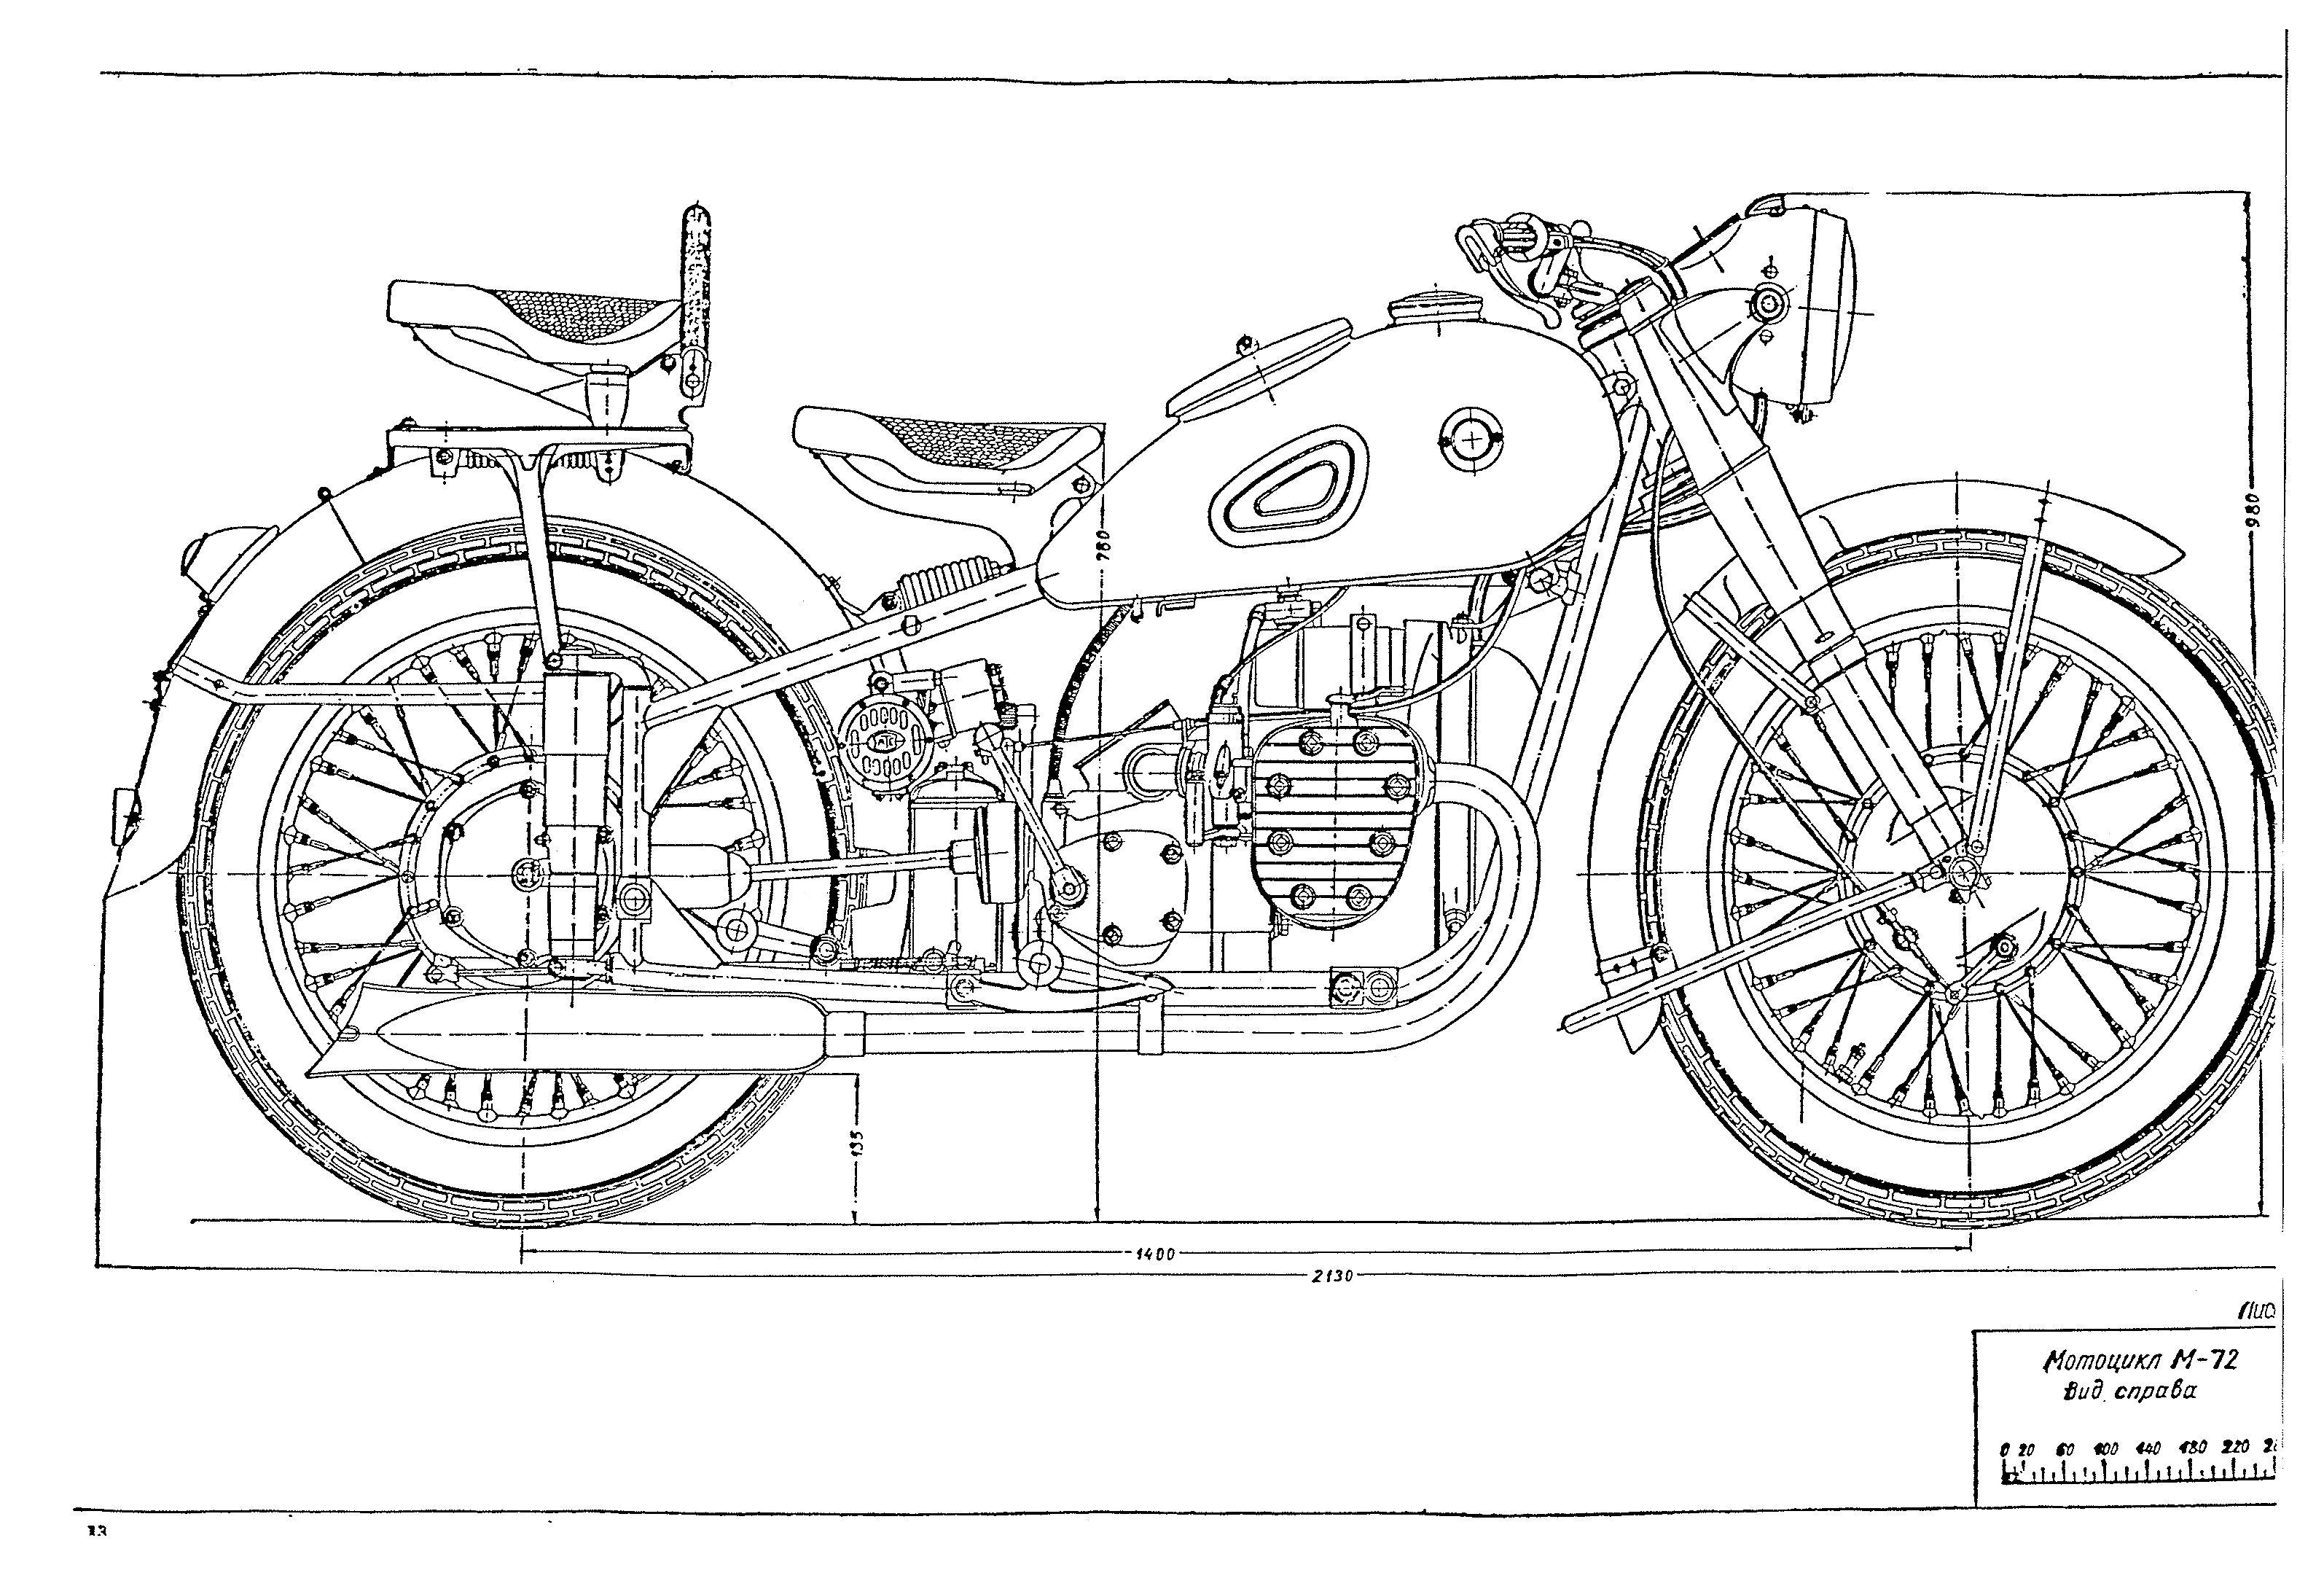 medium resolution of motorcycle blueprints google search